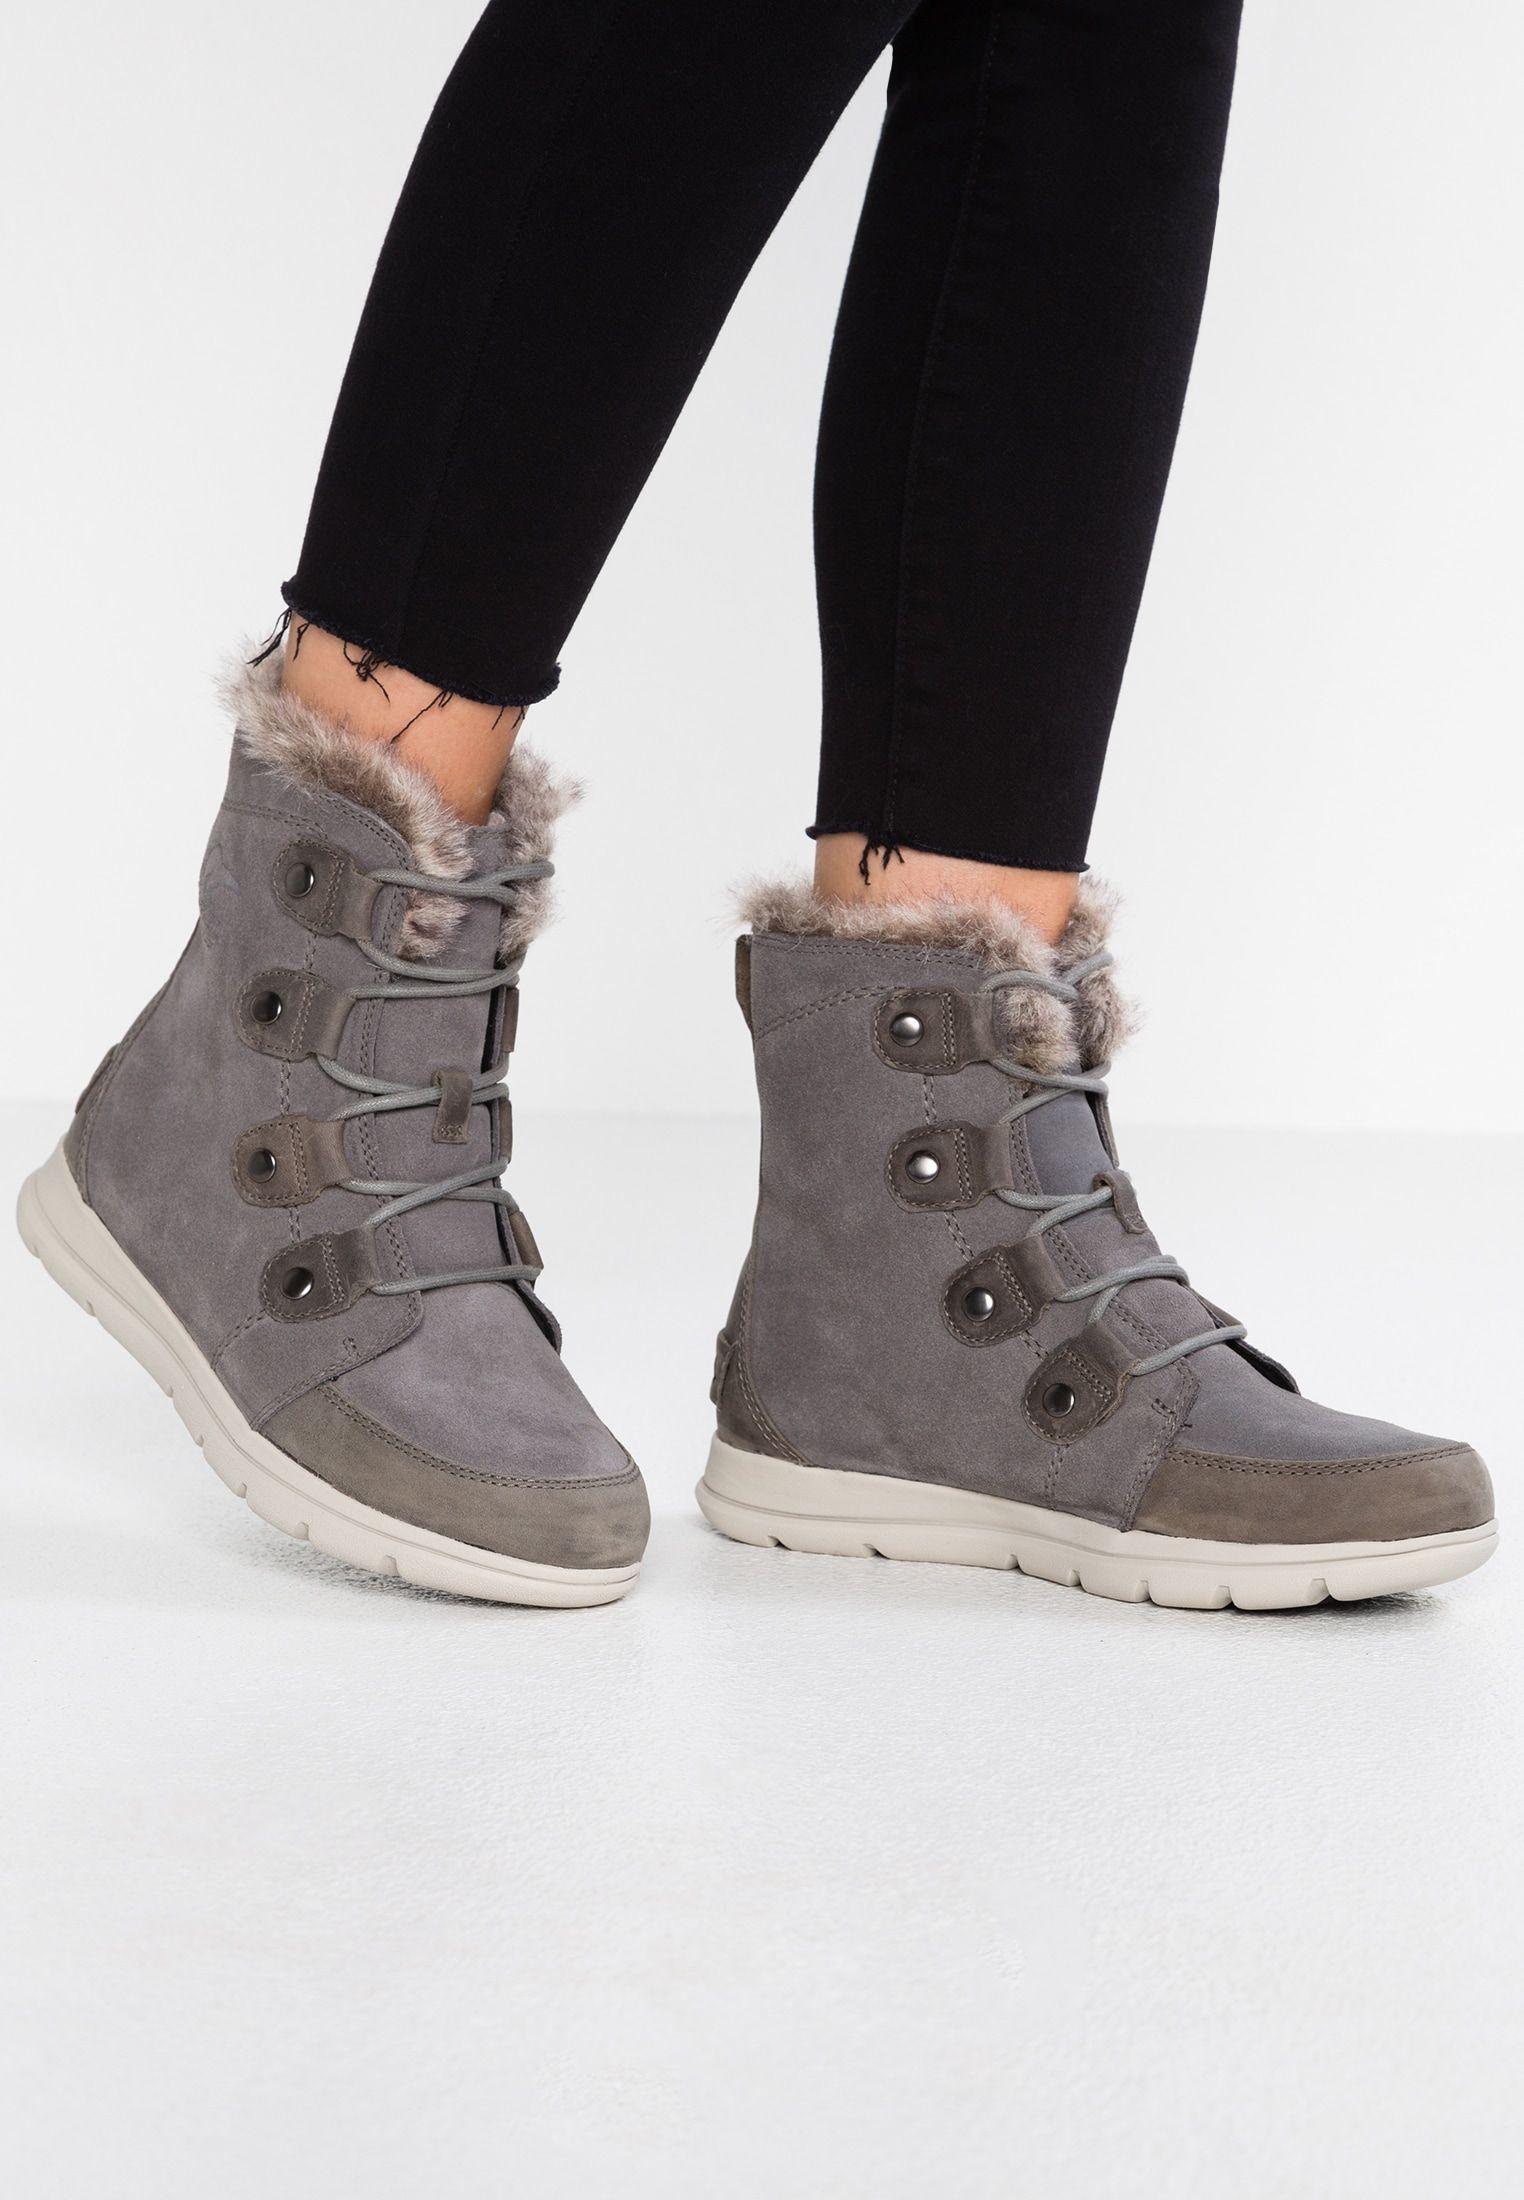 Snowboots Joan Explorer Shoes 2019 Pinterest In Quarryblack OAcSxvw5